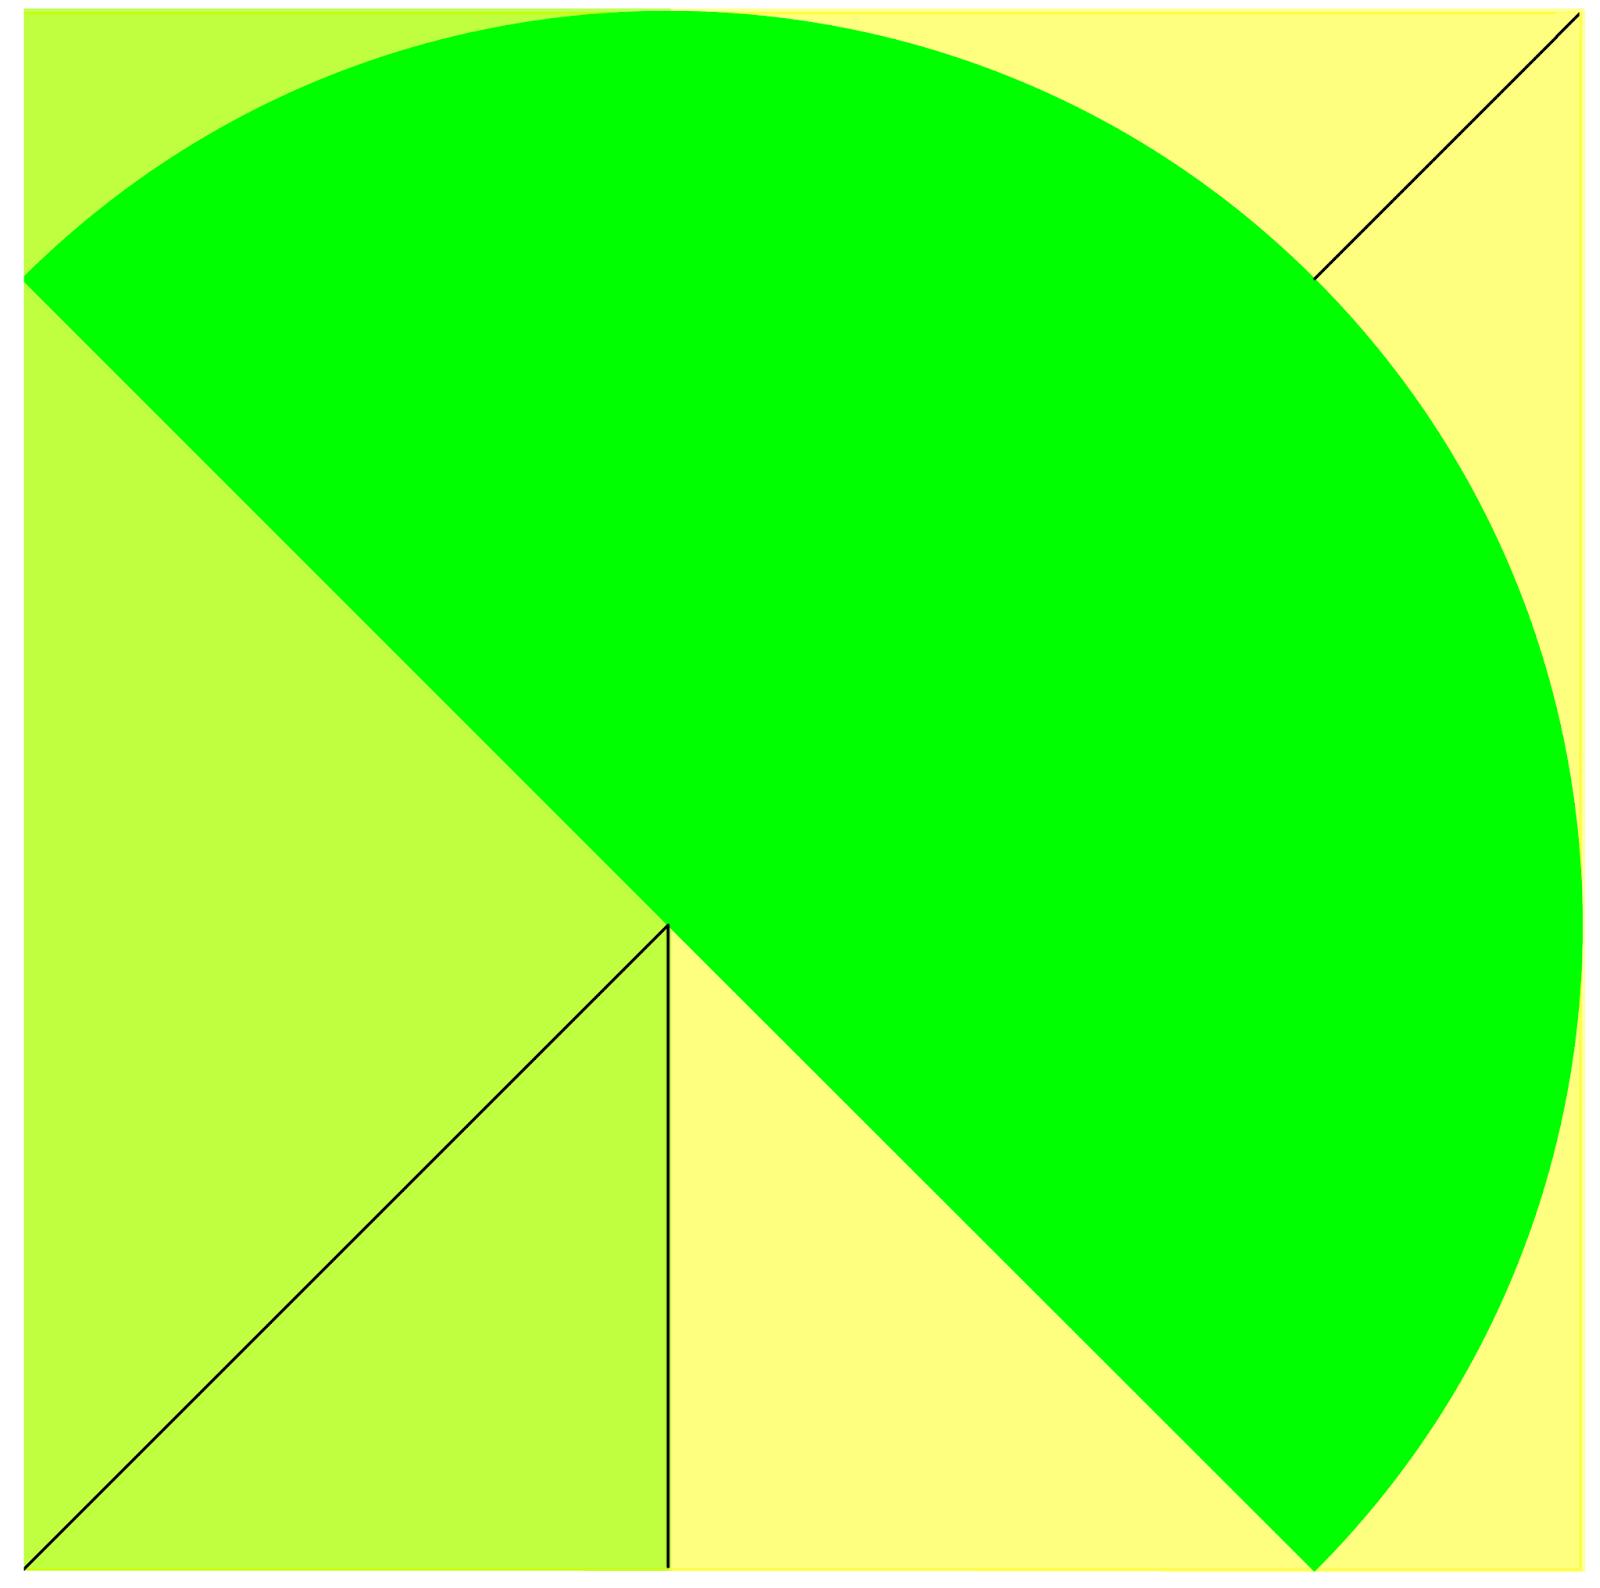 Semicircle The biggest semicircle.